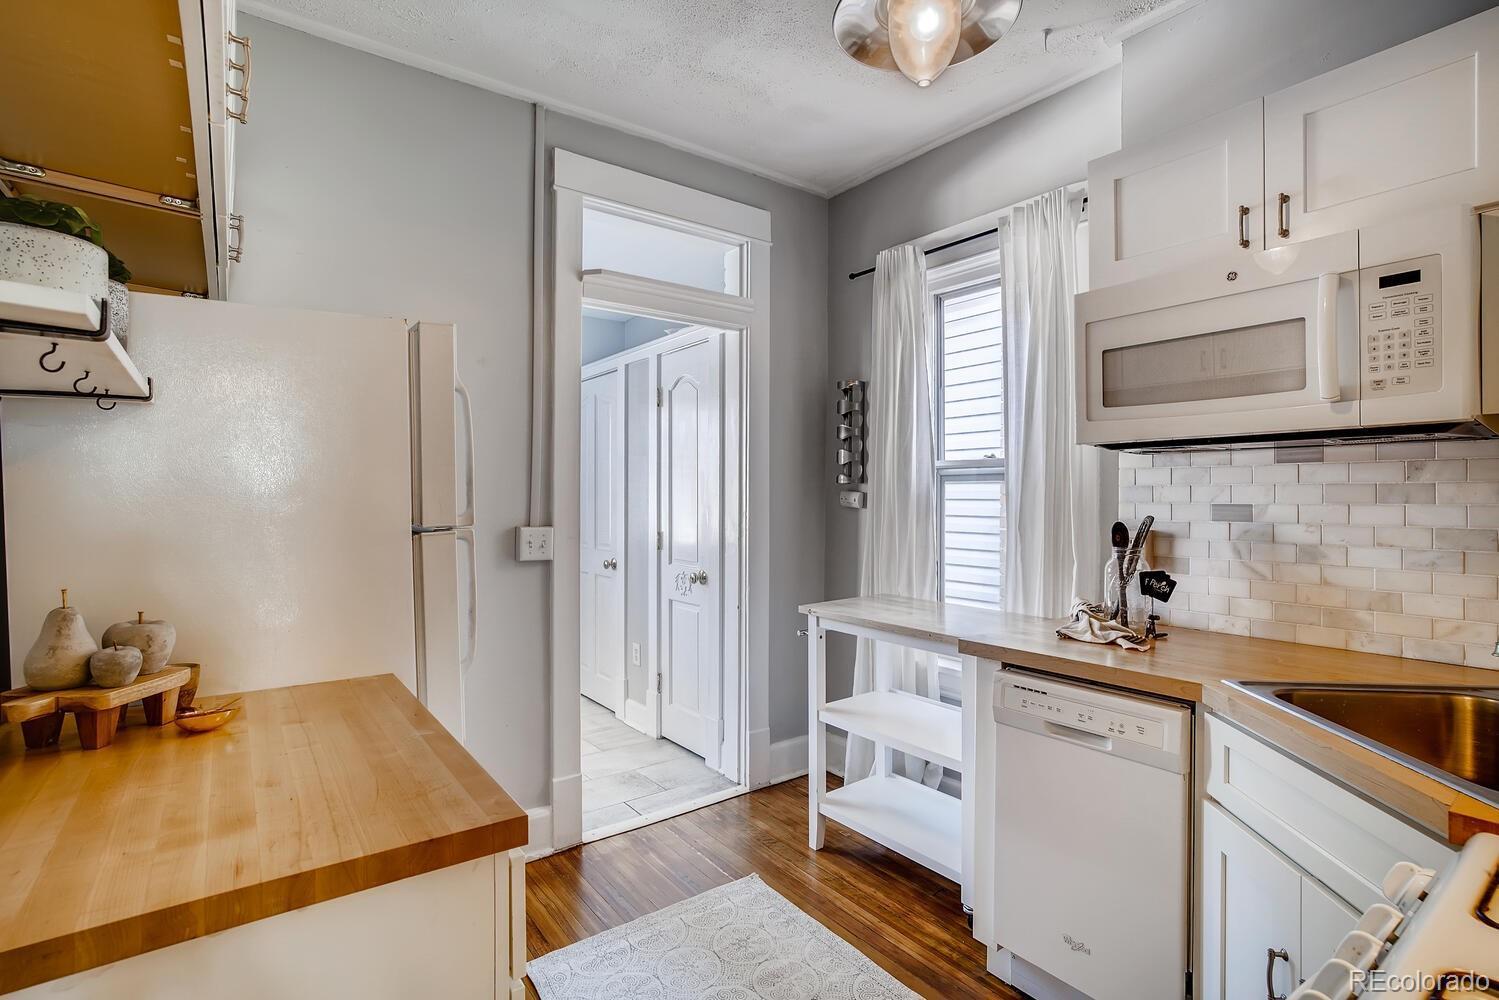 UNDER CONTRACT: 1 Bedroom 1 Bathroom Uptown Condo with Rare Bonus Home Office photo